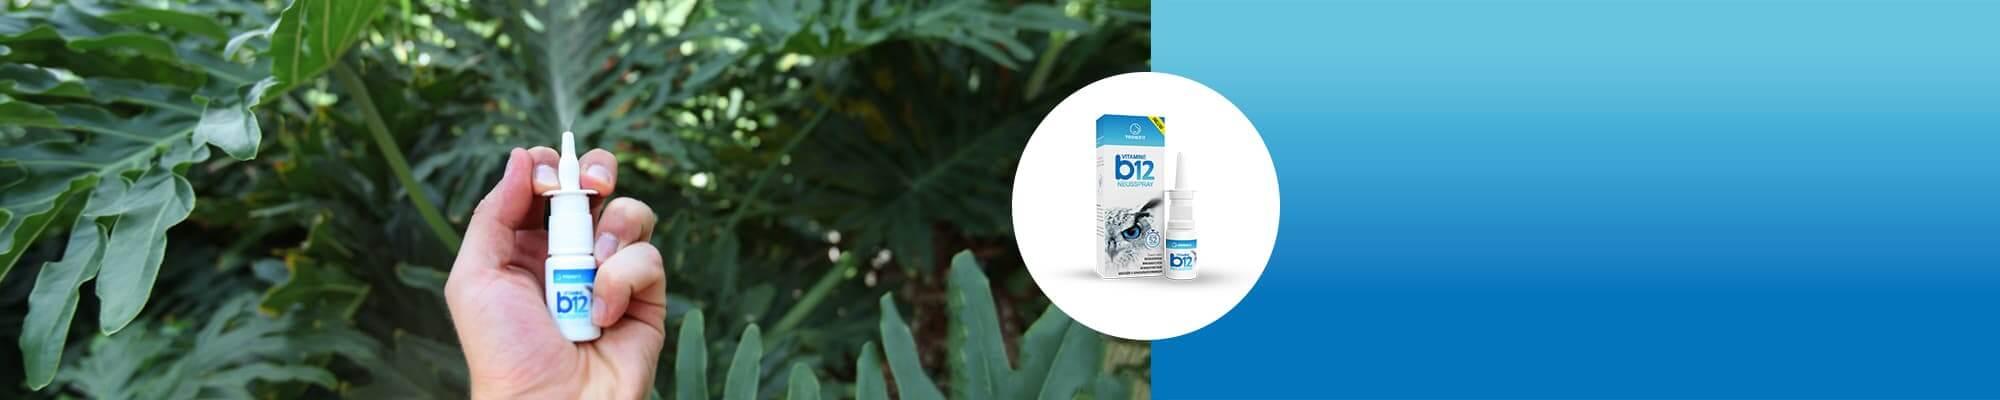 Pronofit Vitamine B12 Neusspray banner